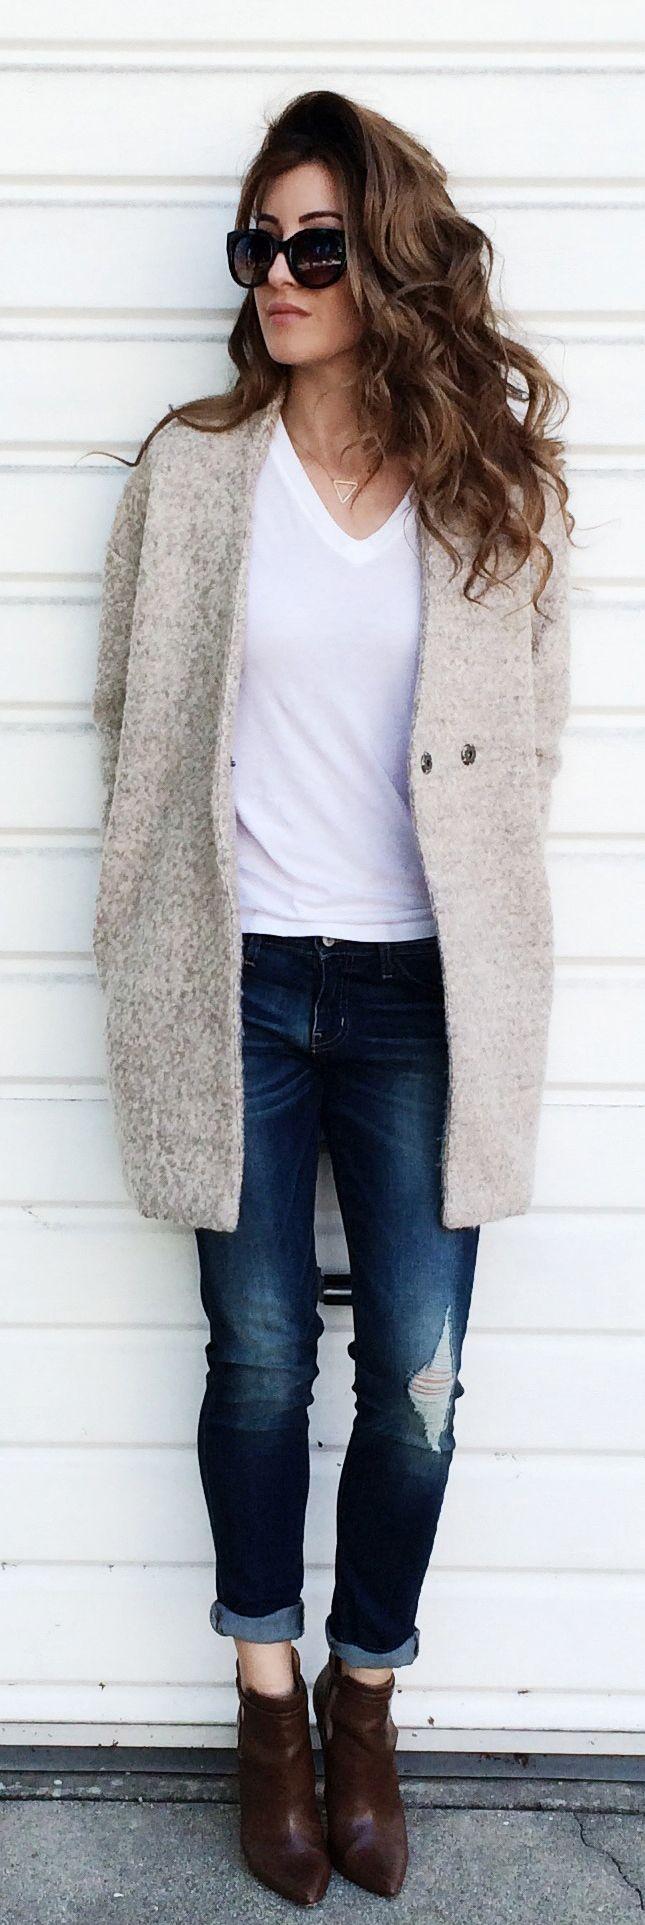 #street #style casual / coat + tee + denim @wachabuy